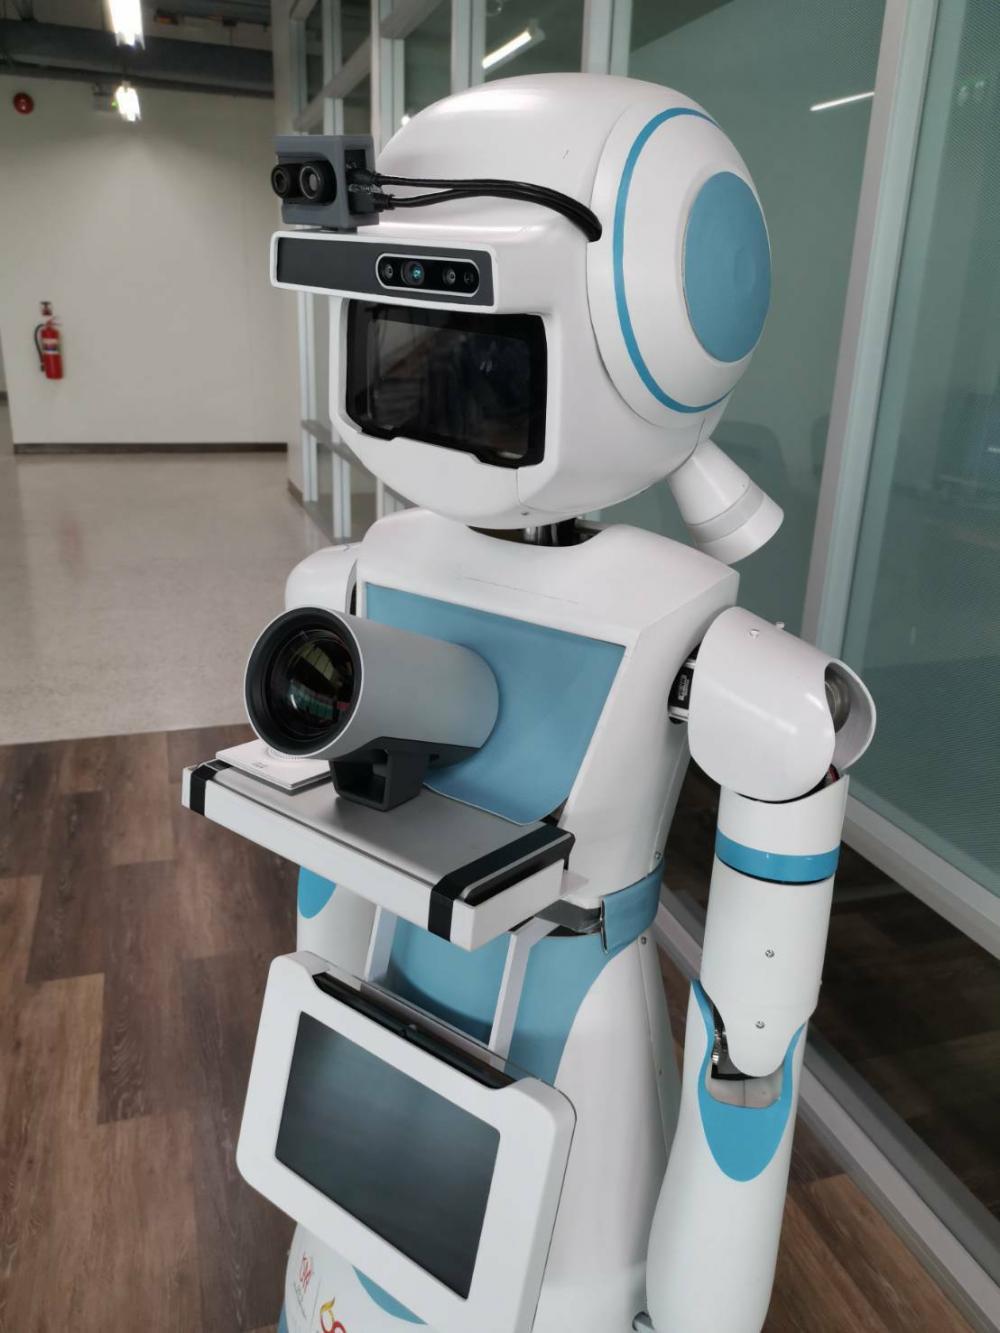 FIBO unveils robots for outbreak